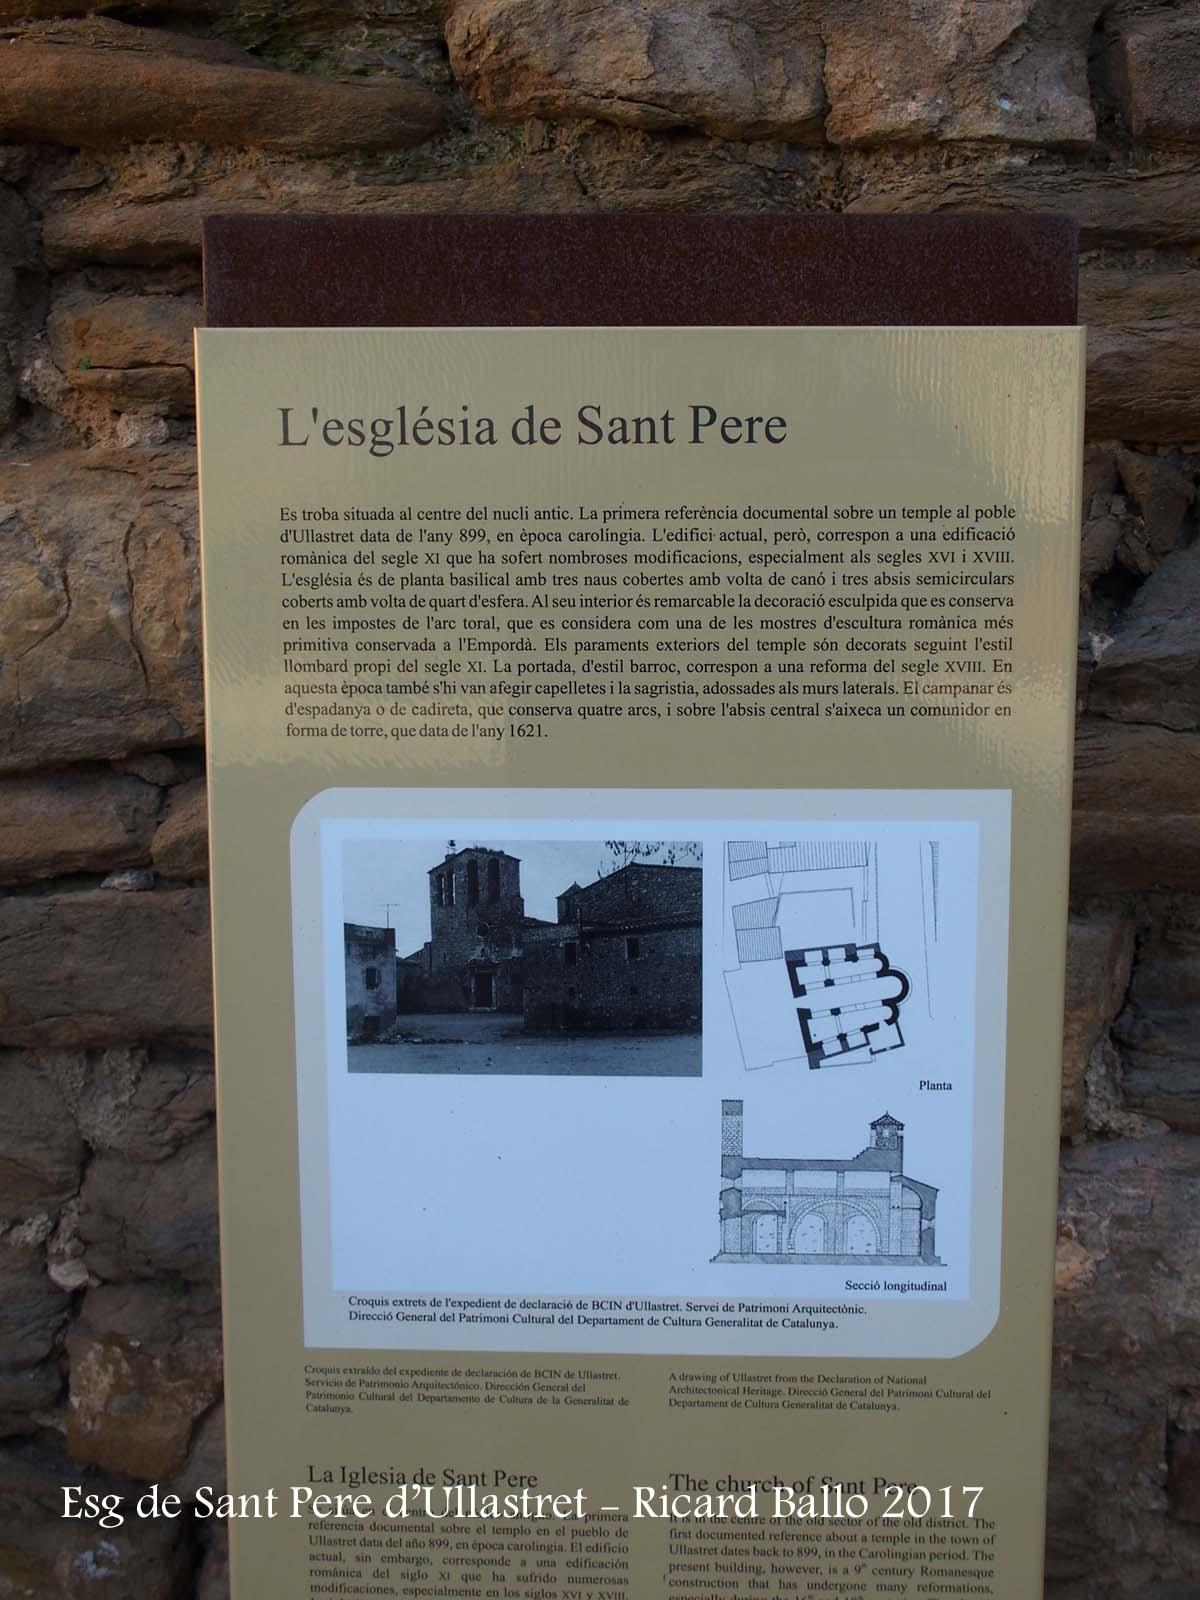 Església de Sant Pere – Ullastret - Plafó informatiu situat vora l'església